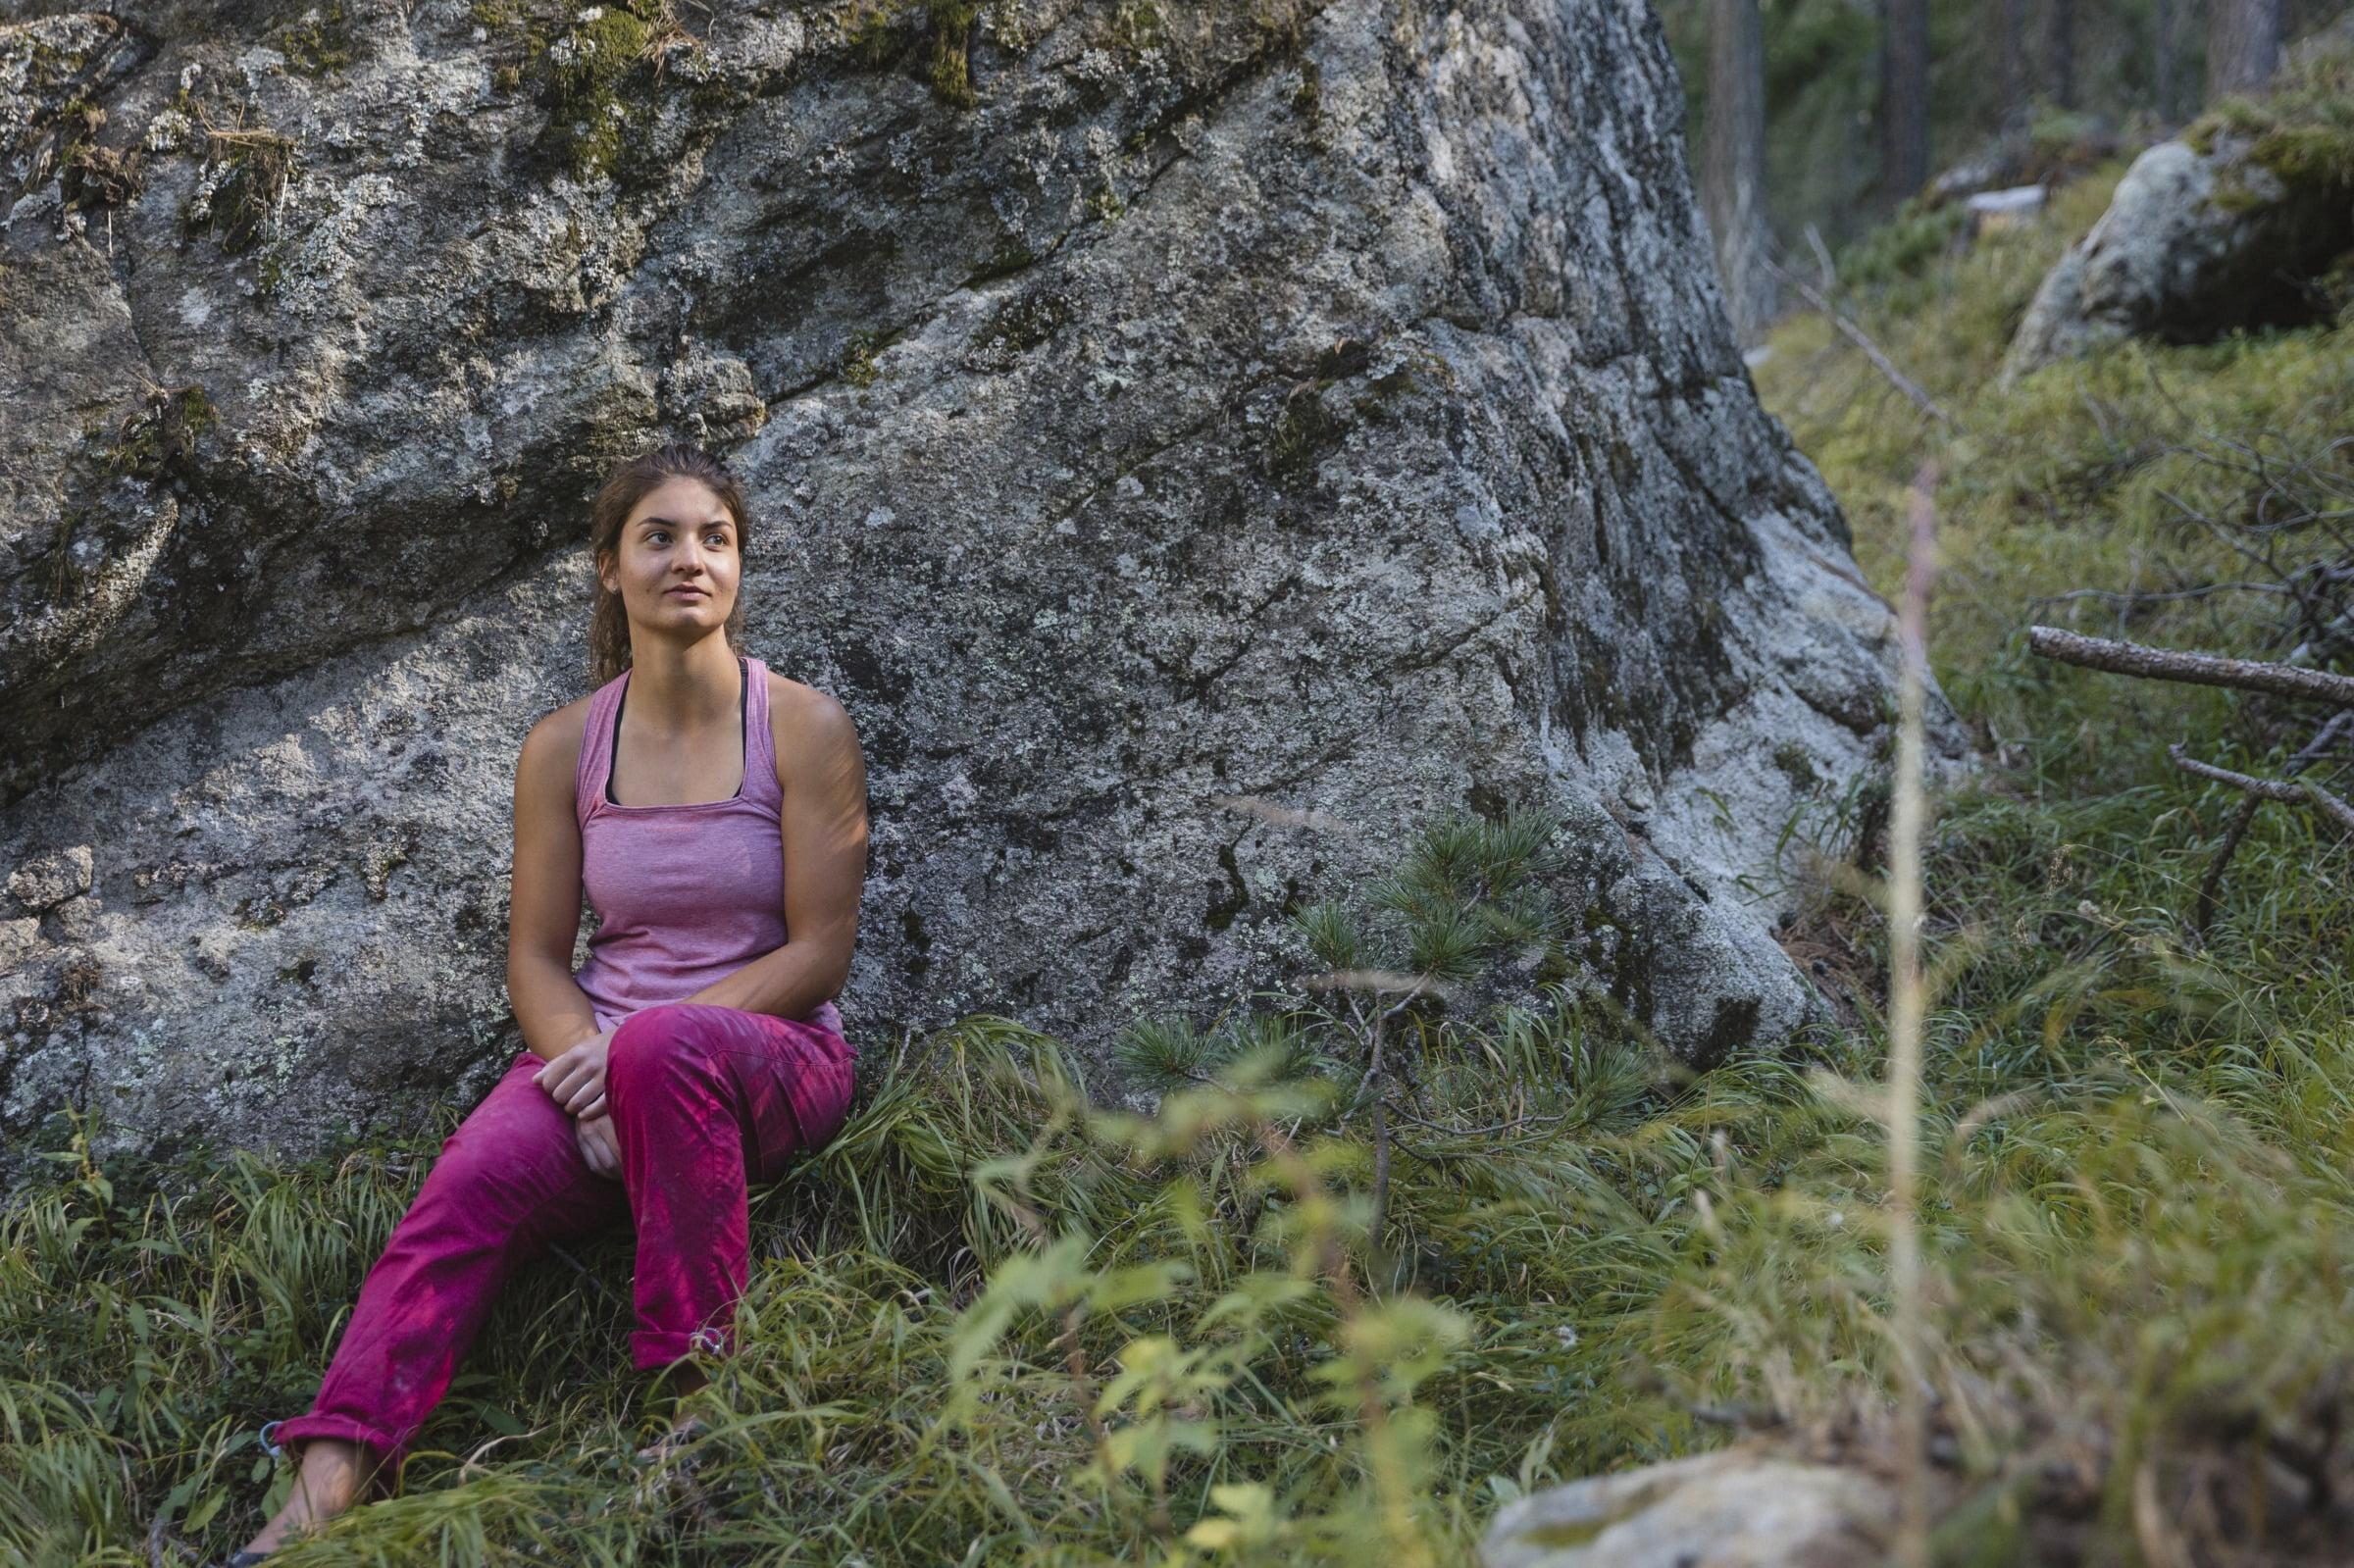 Leä Bärfuss: Zug um Zug - Bouldern im Engadin